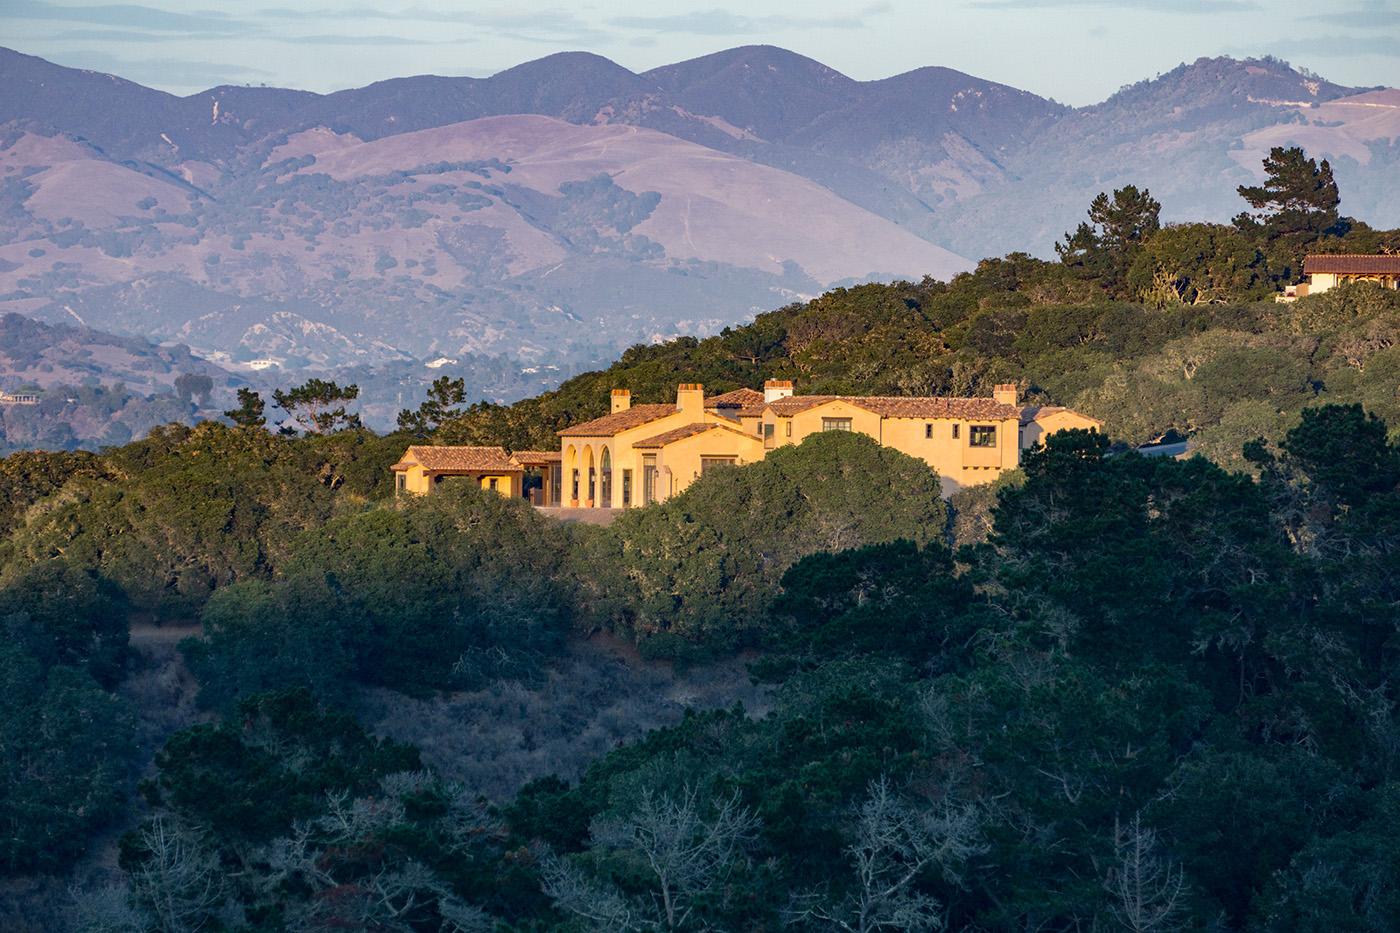 Kraft Residence - context-rolling hillsides of Monterra